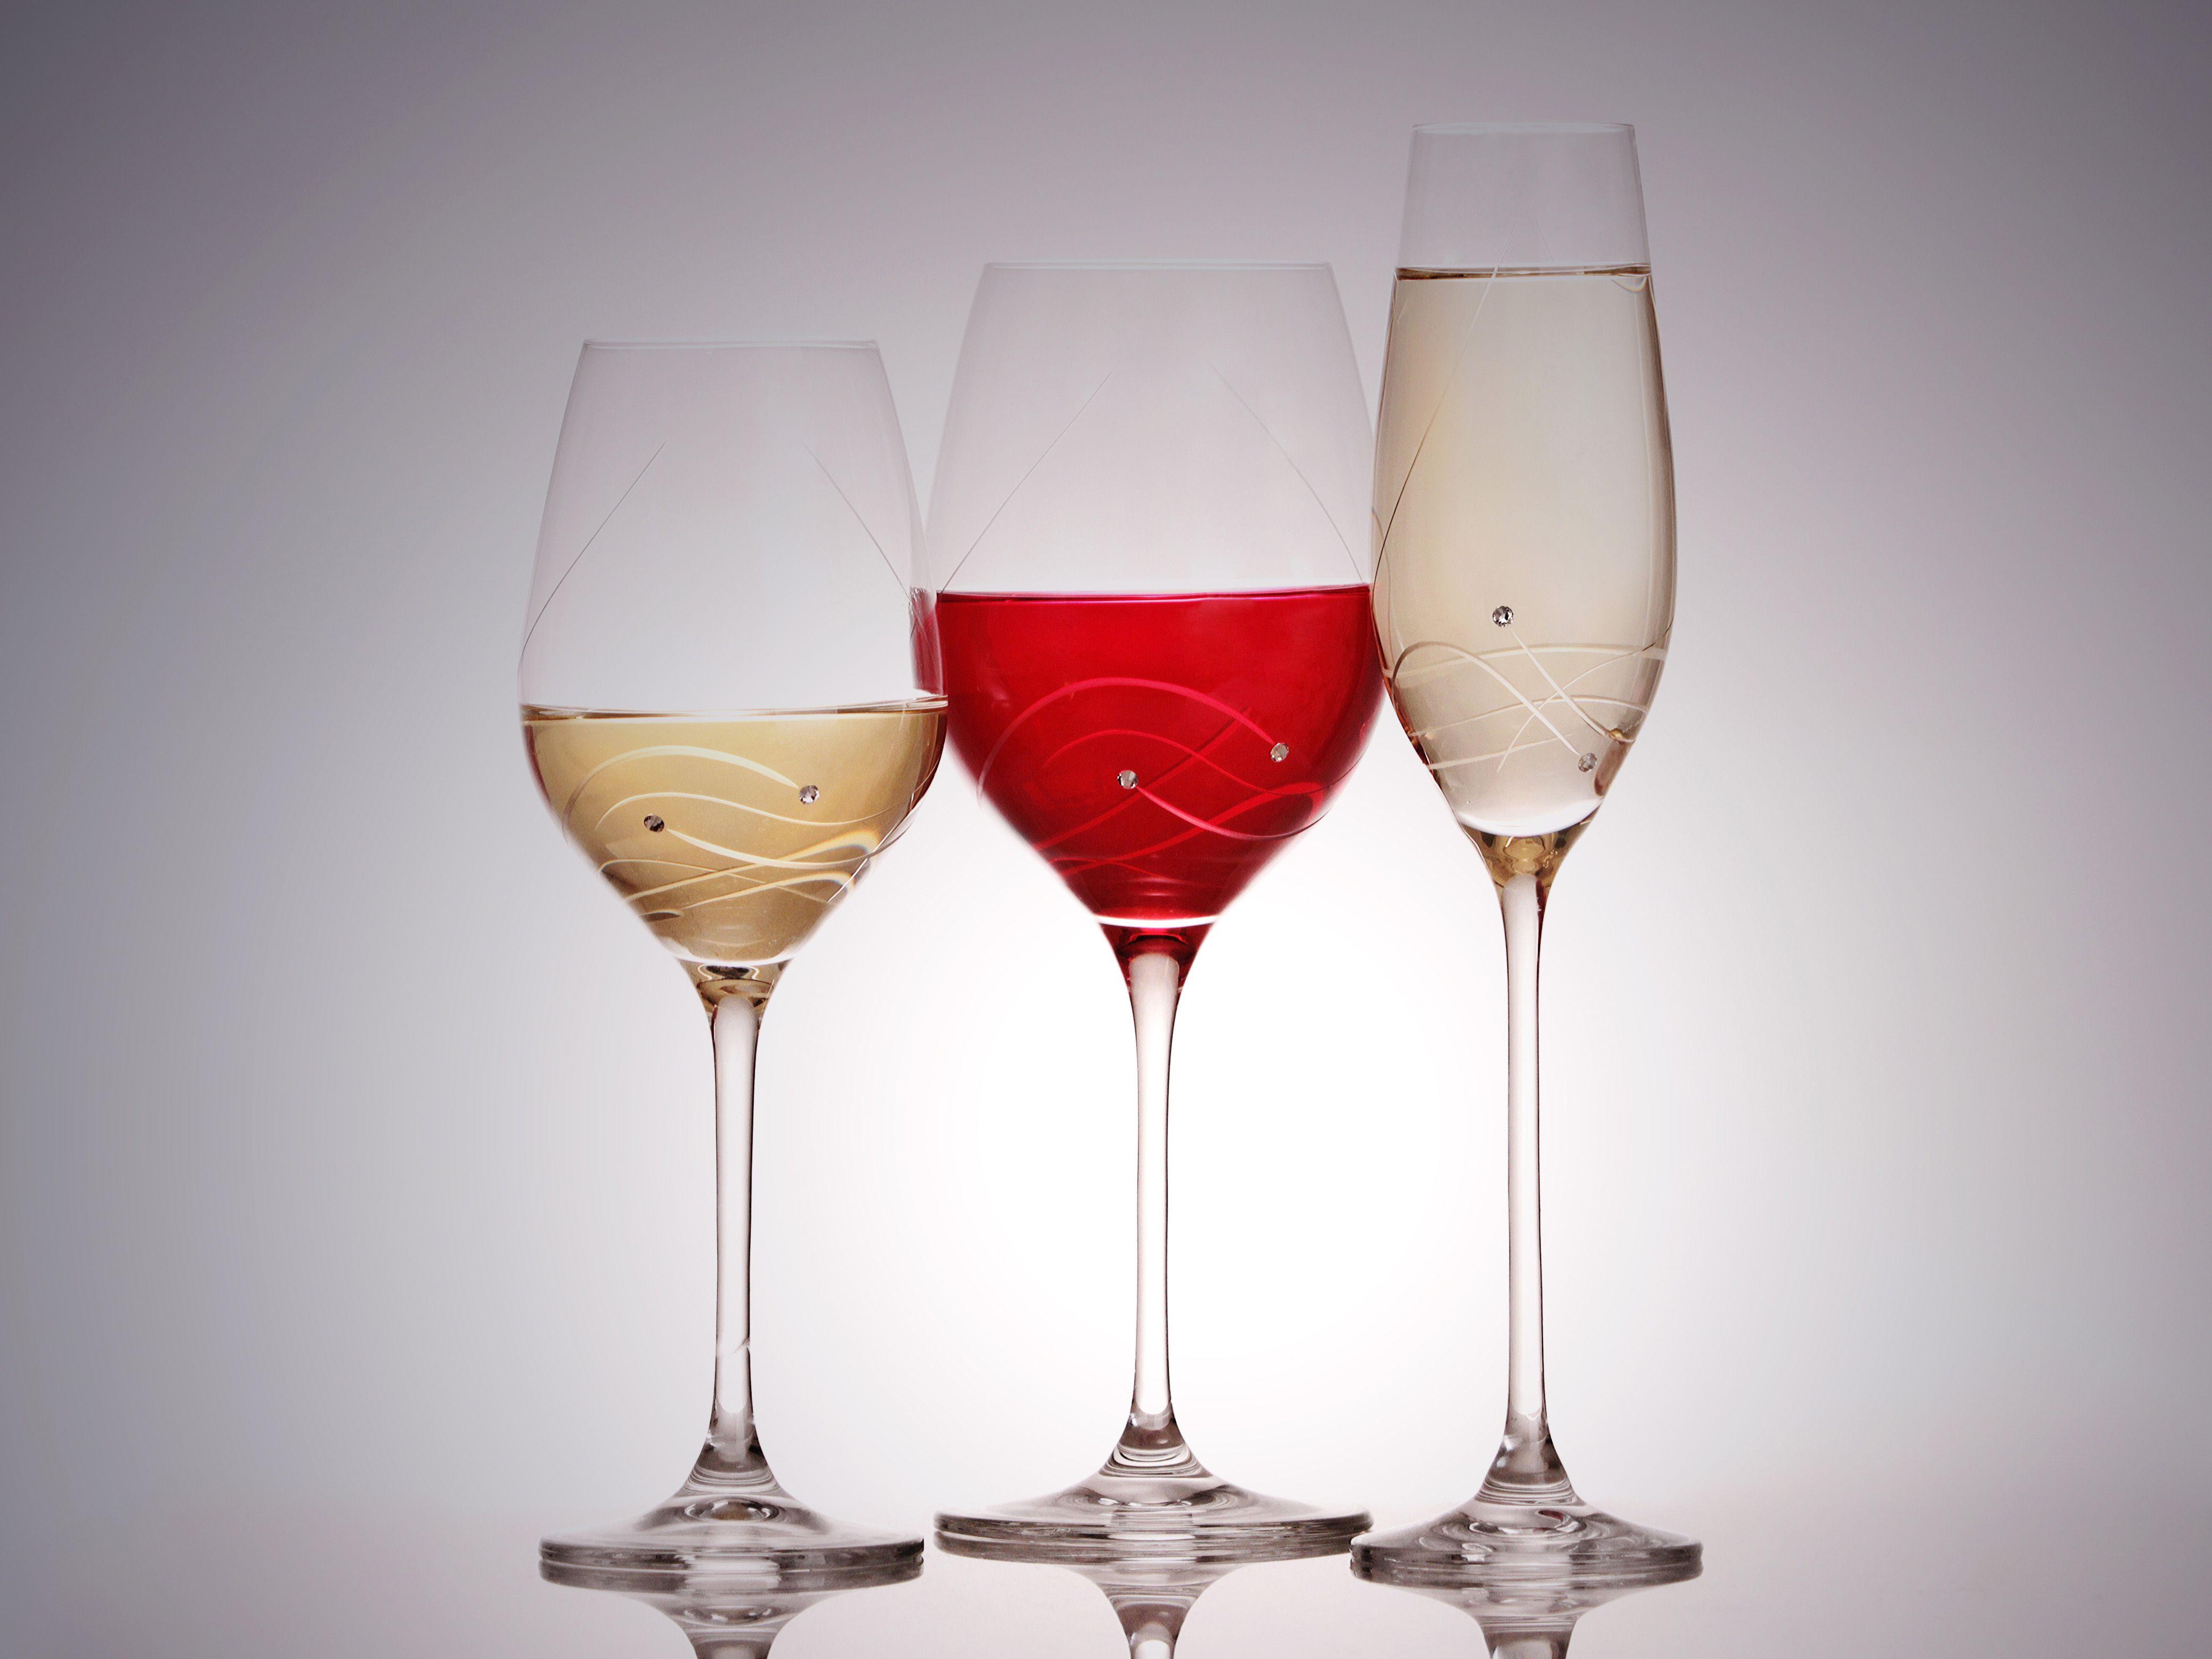 Pohare Do Kazdej Domacnosti Www Crystal4europe Eu Wine Glassware Wine Glasses